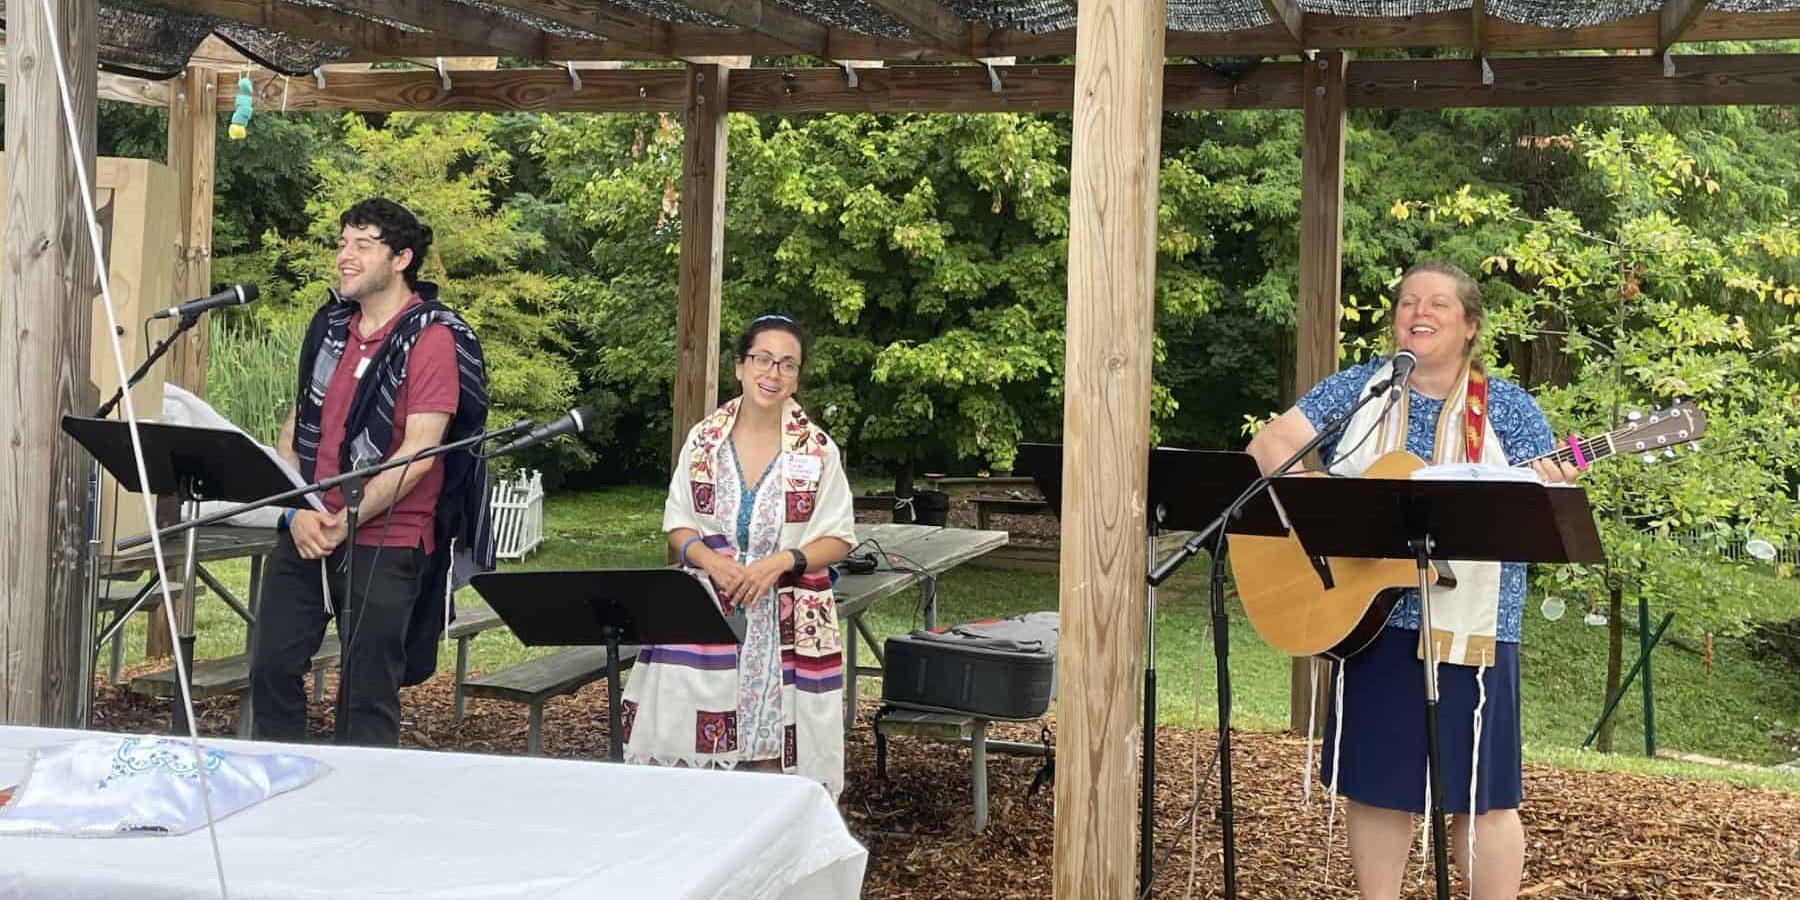 Rabbi Rachel Ackerman, Rabbi Educator Joshua Gischner, and Cantorial Soloist Emily Meyer leading first post-pandemic outdoor Erev Shabbat service (July 9, 2021)